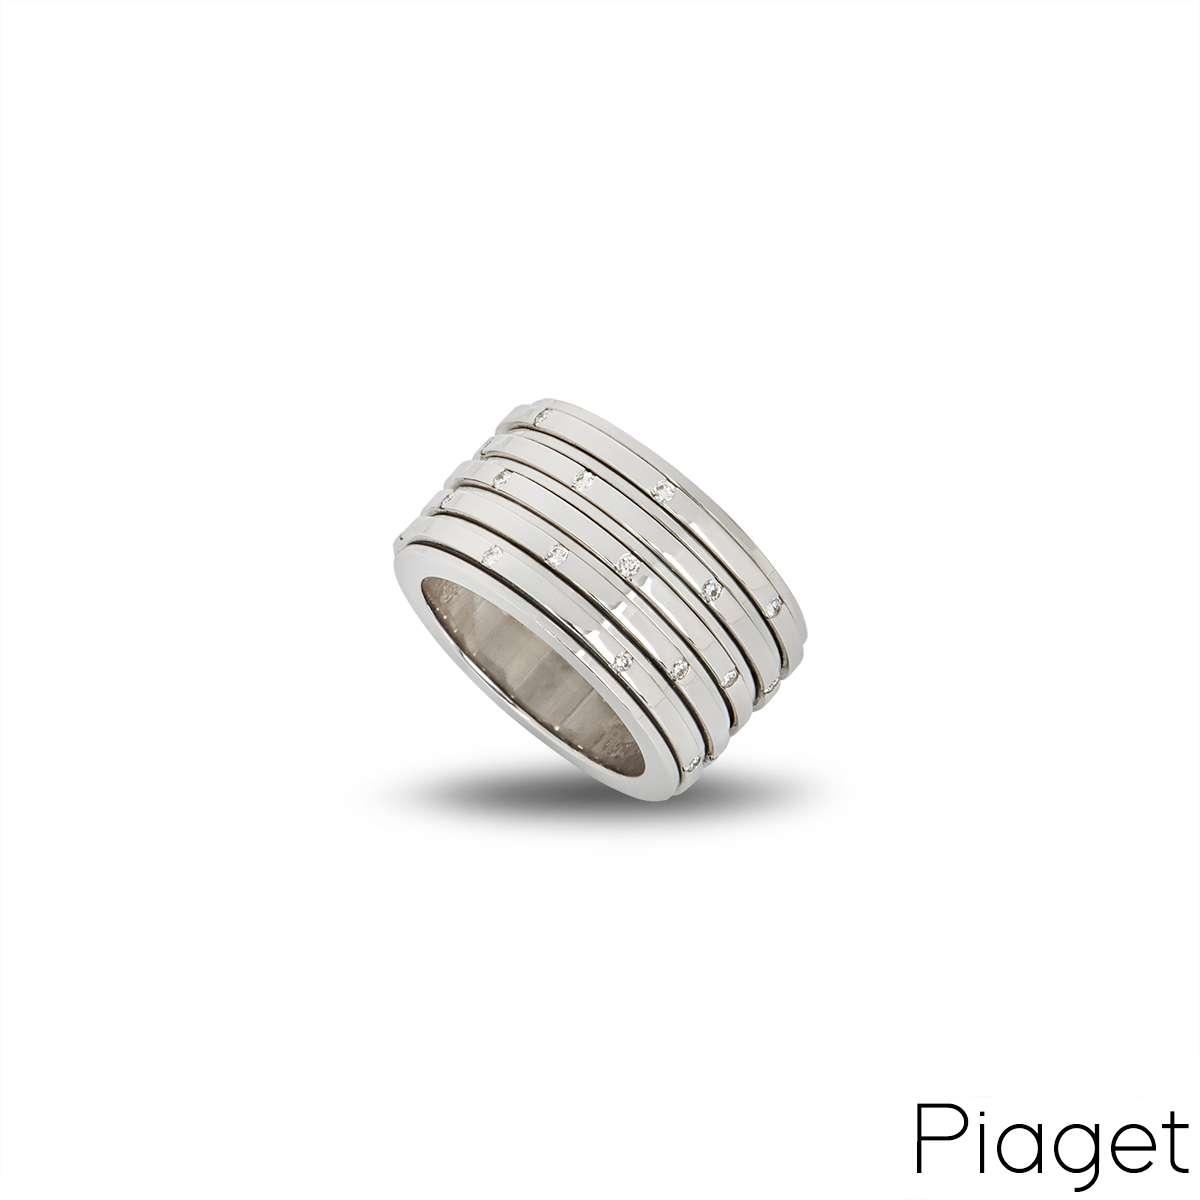 Piaget 18k White Gold Diamond Possession Ring Size 52 B&P G34PO852